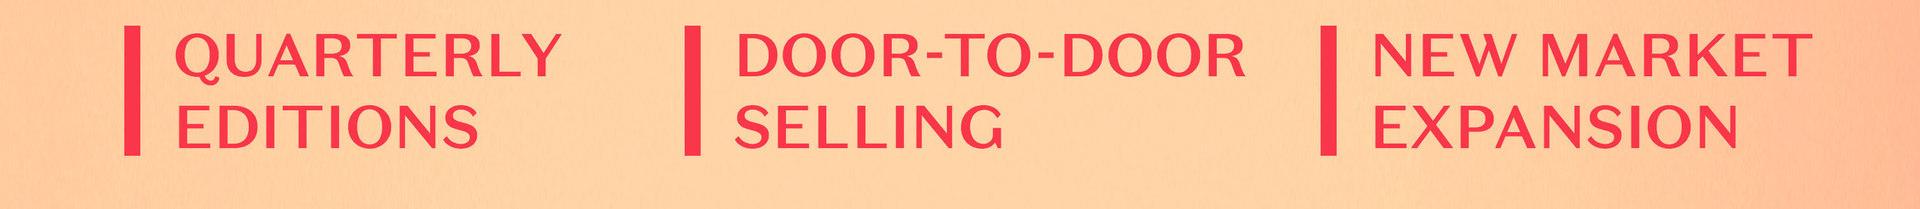 rodapé com cartacterísicas do projeto - Quarterly Editions - Door-to-door selling - New Market expansion